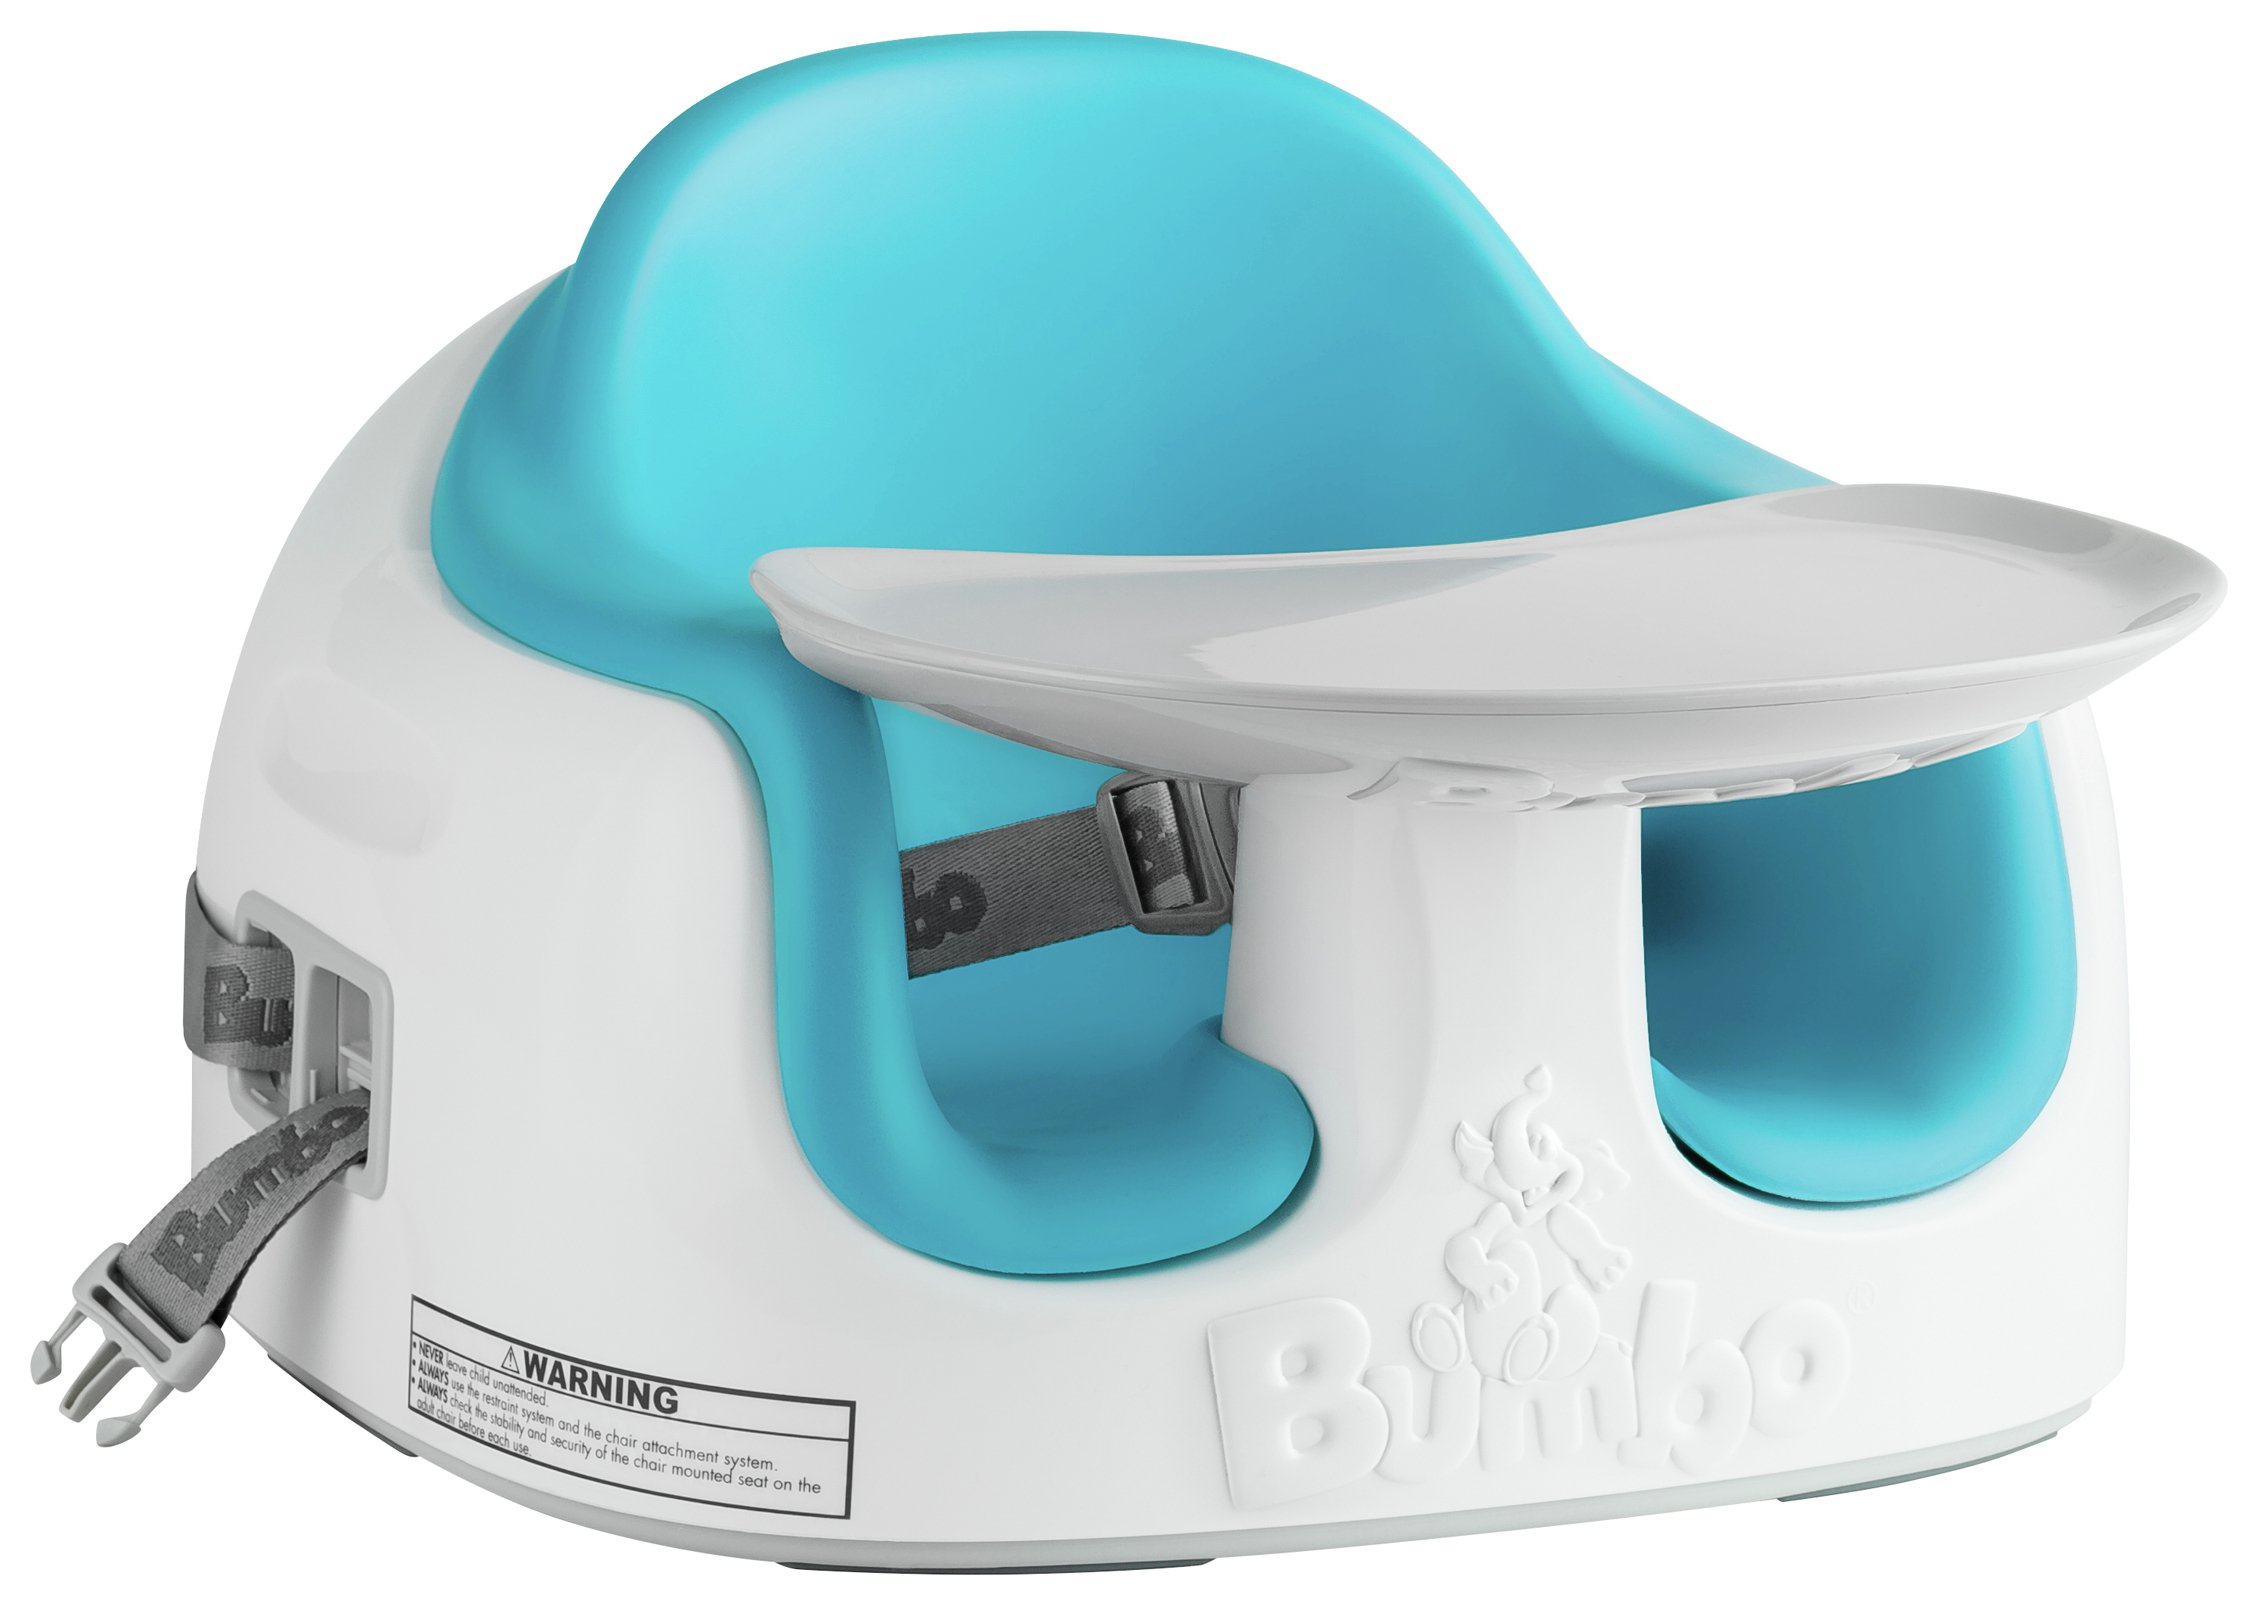 Image of Bumbo Multi Seat - Blue.